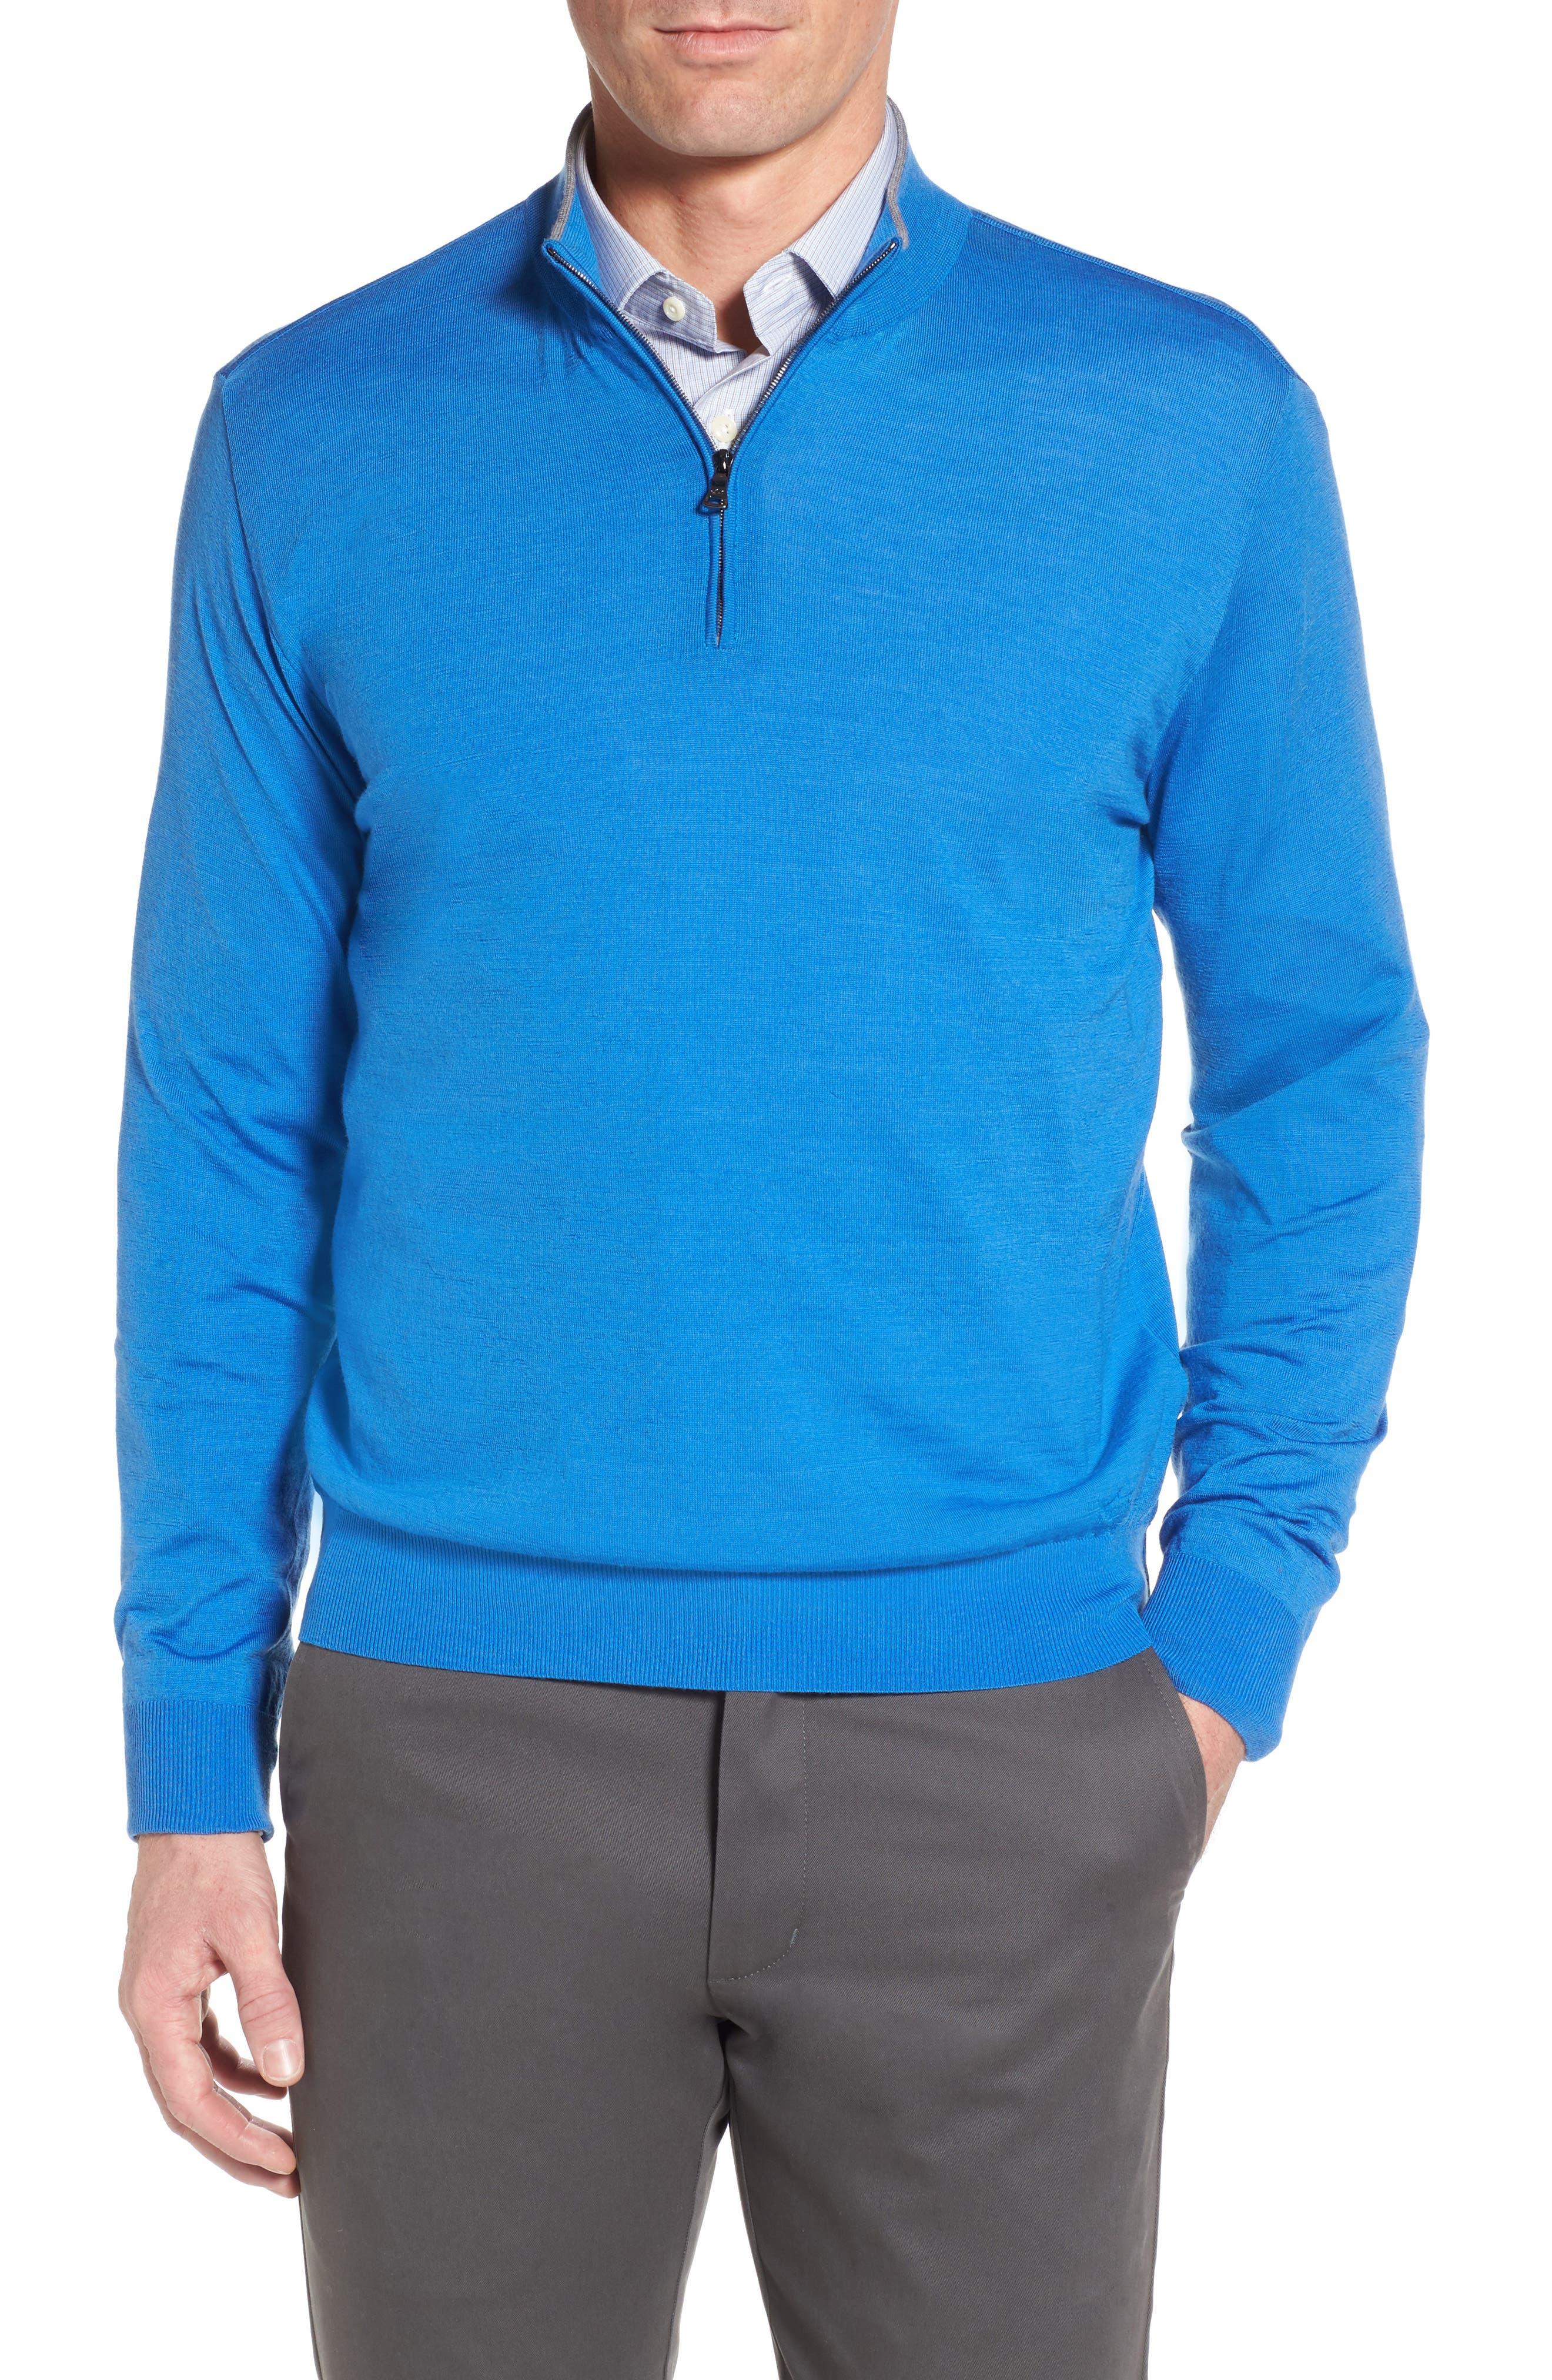 Alternate Image 1 Selected - Paul & Shark Quarter Zip Wool Pullover